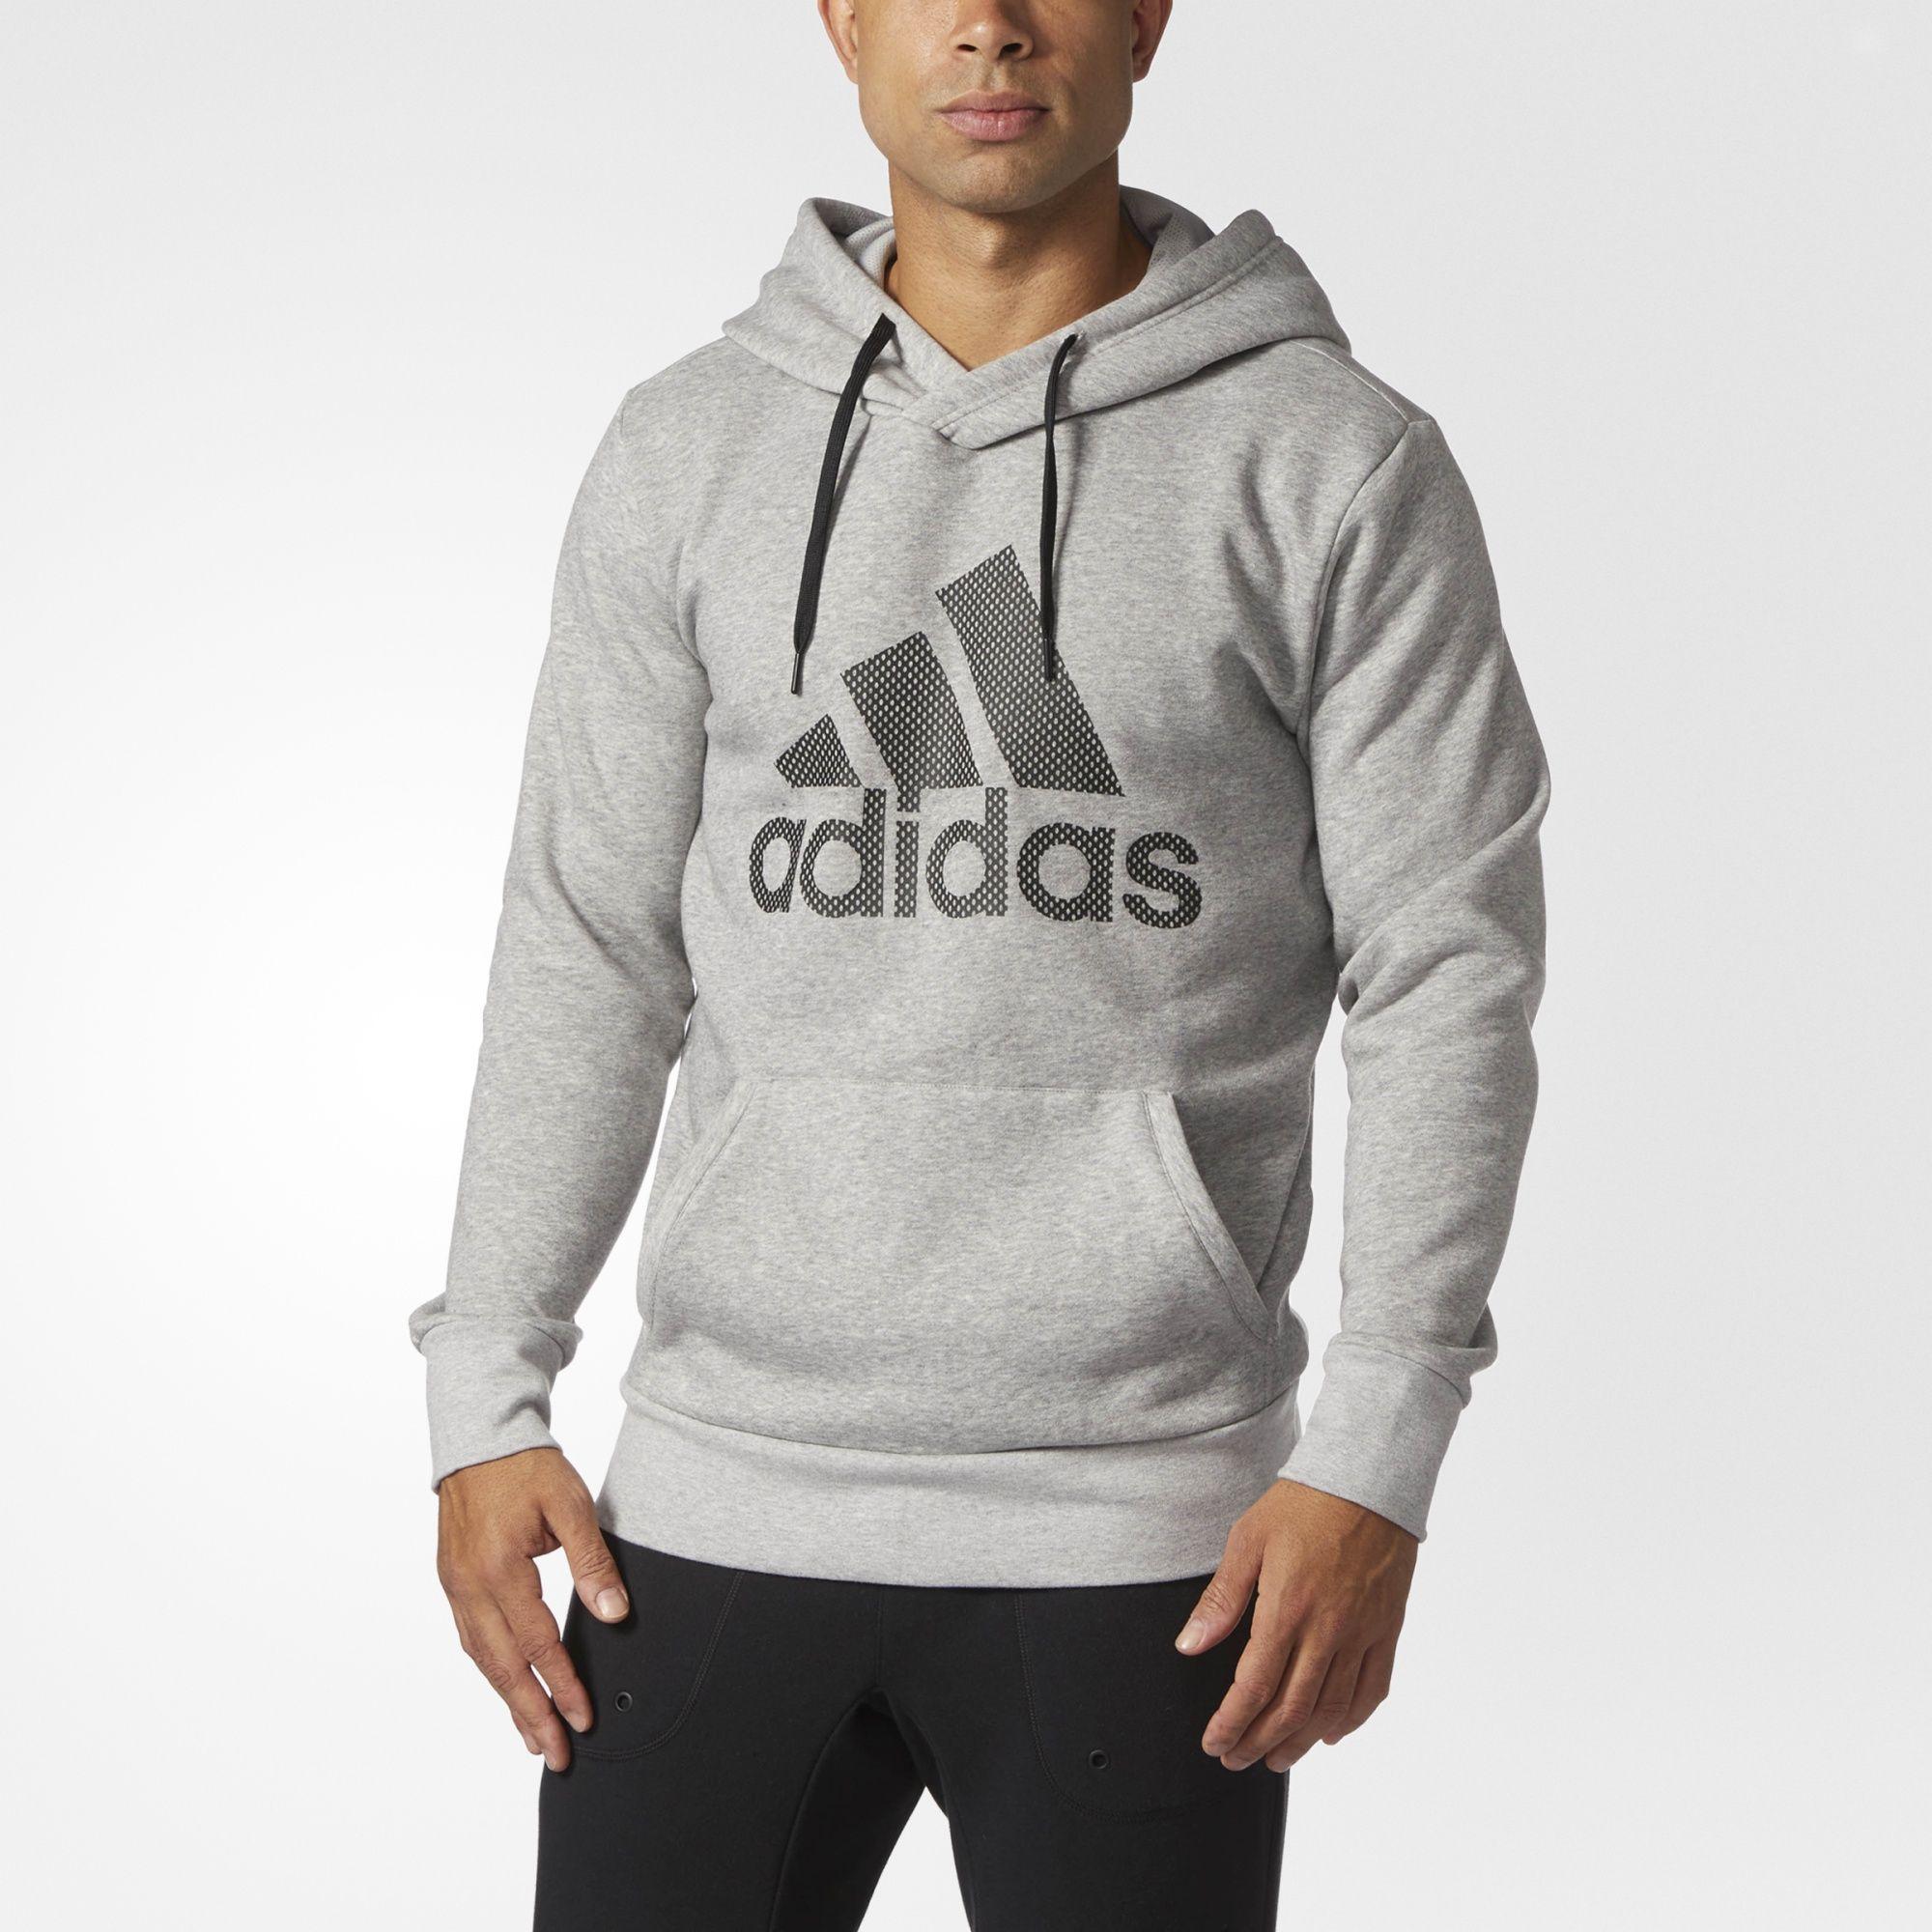 Men's Hoodies & Sweatshirts: Trefoil Logo, ZNE &